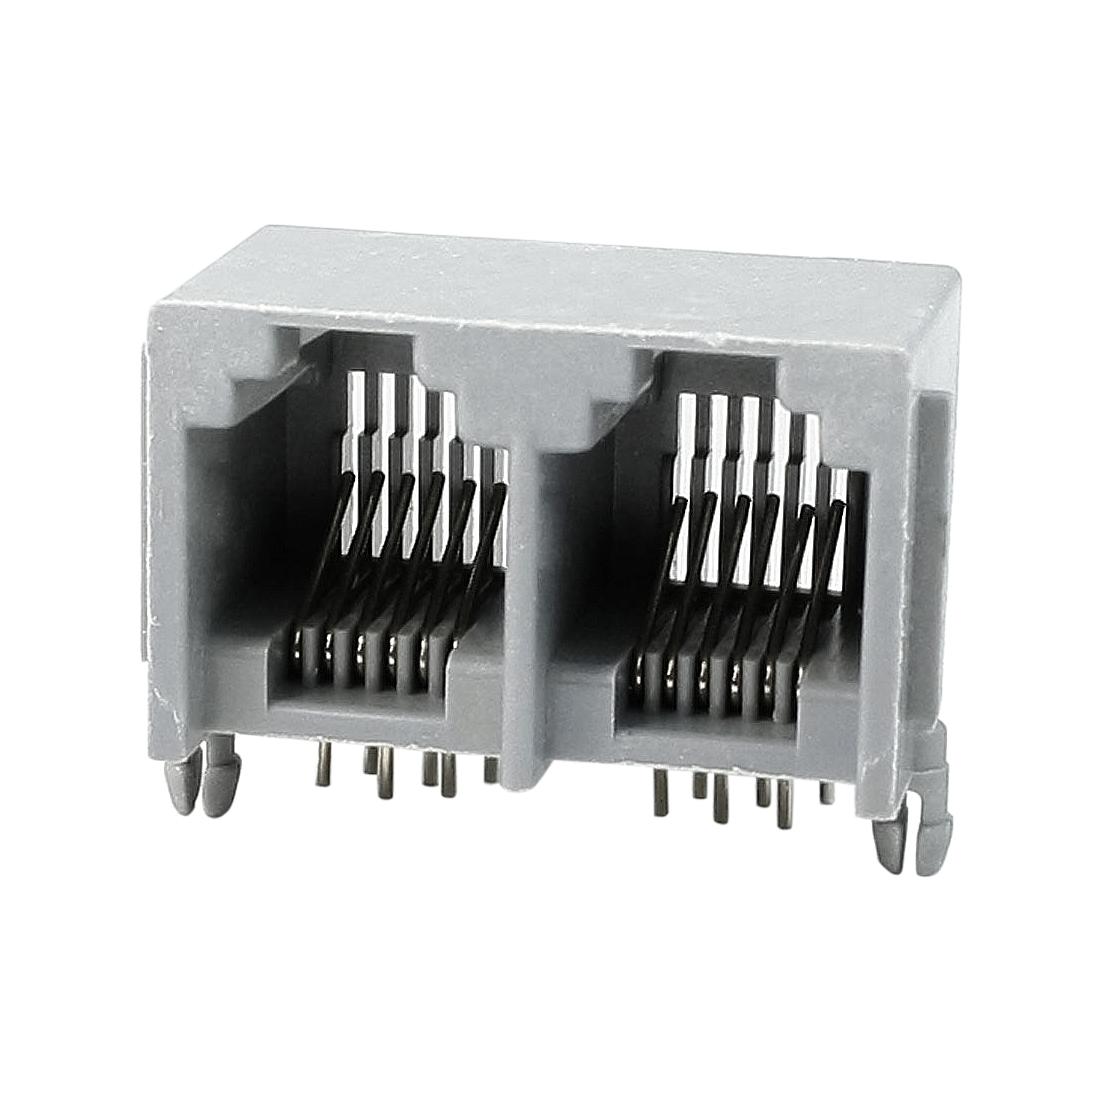 10 Pcs RJ12 6P6C 2 Way Computer Internet Network PCB Jack Socket Gray